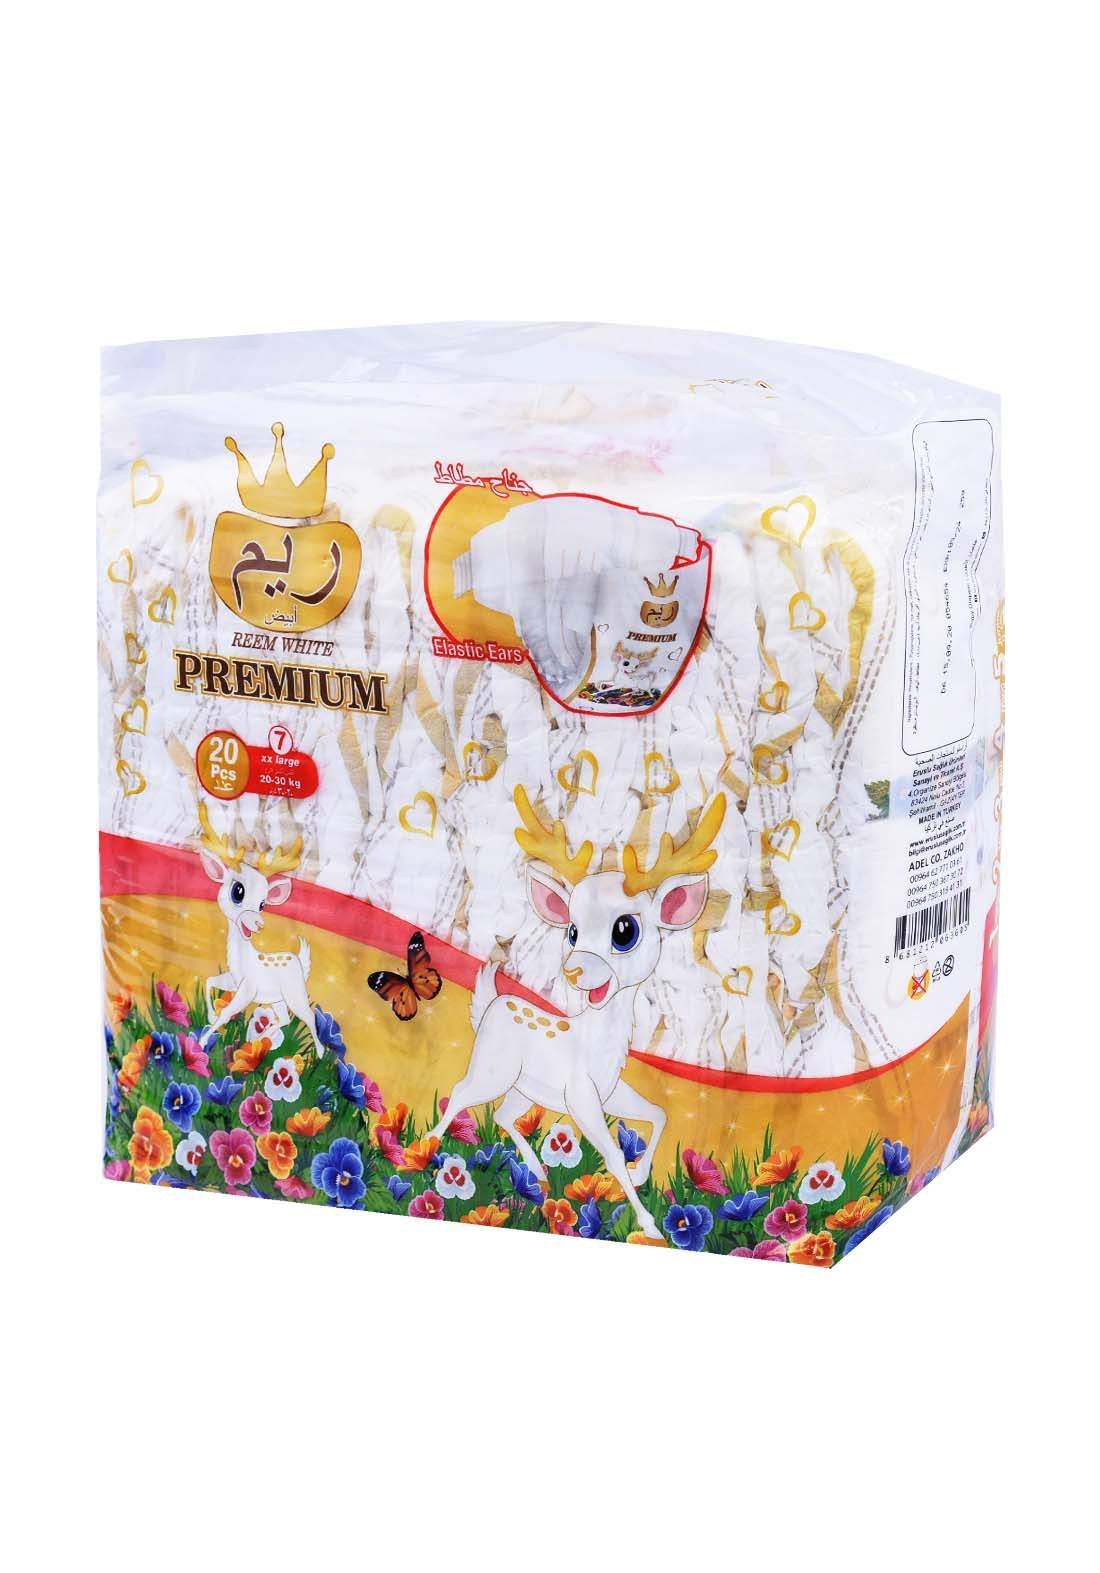 Reem White 20-30 kg 20 Pcs حفاضات ريم  للاطفال رقم 7 عادي